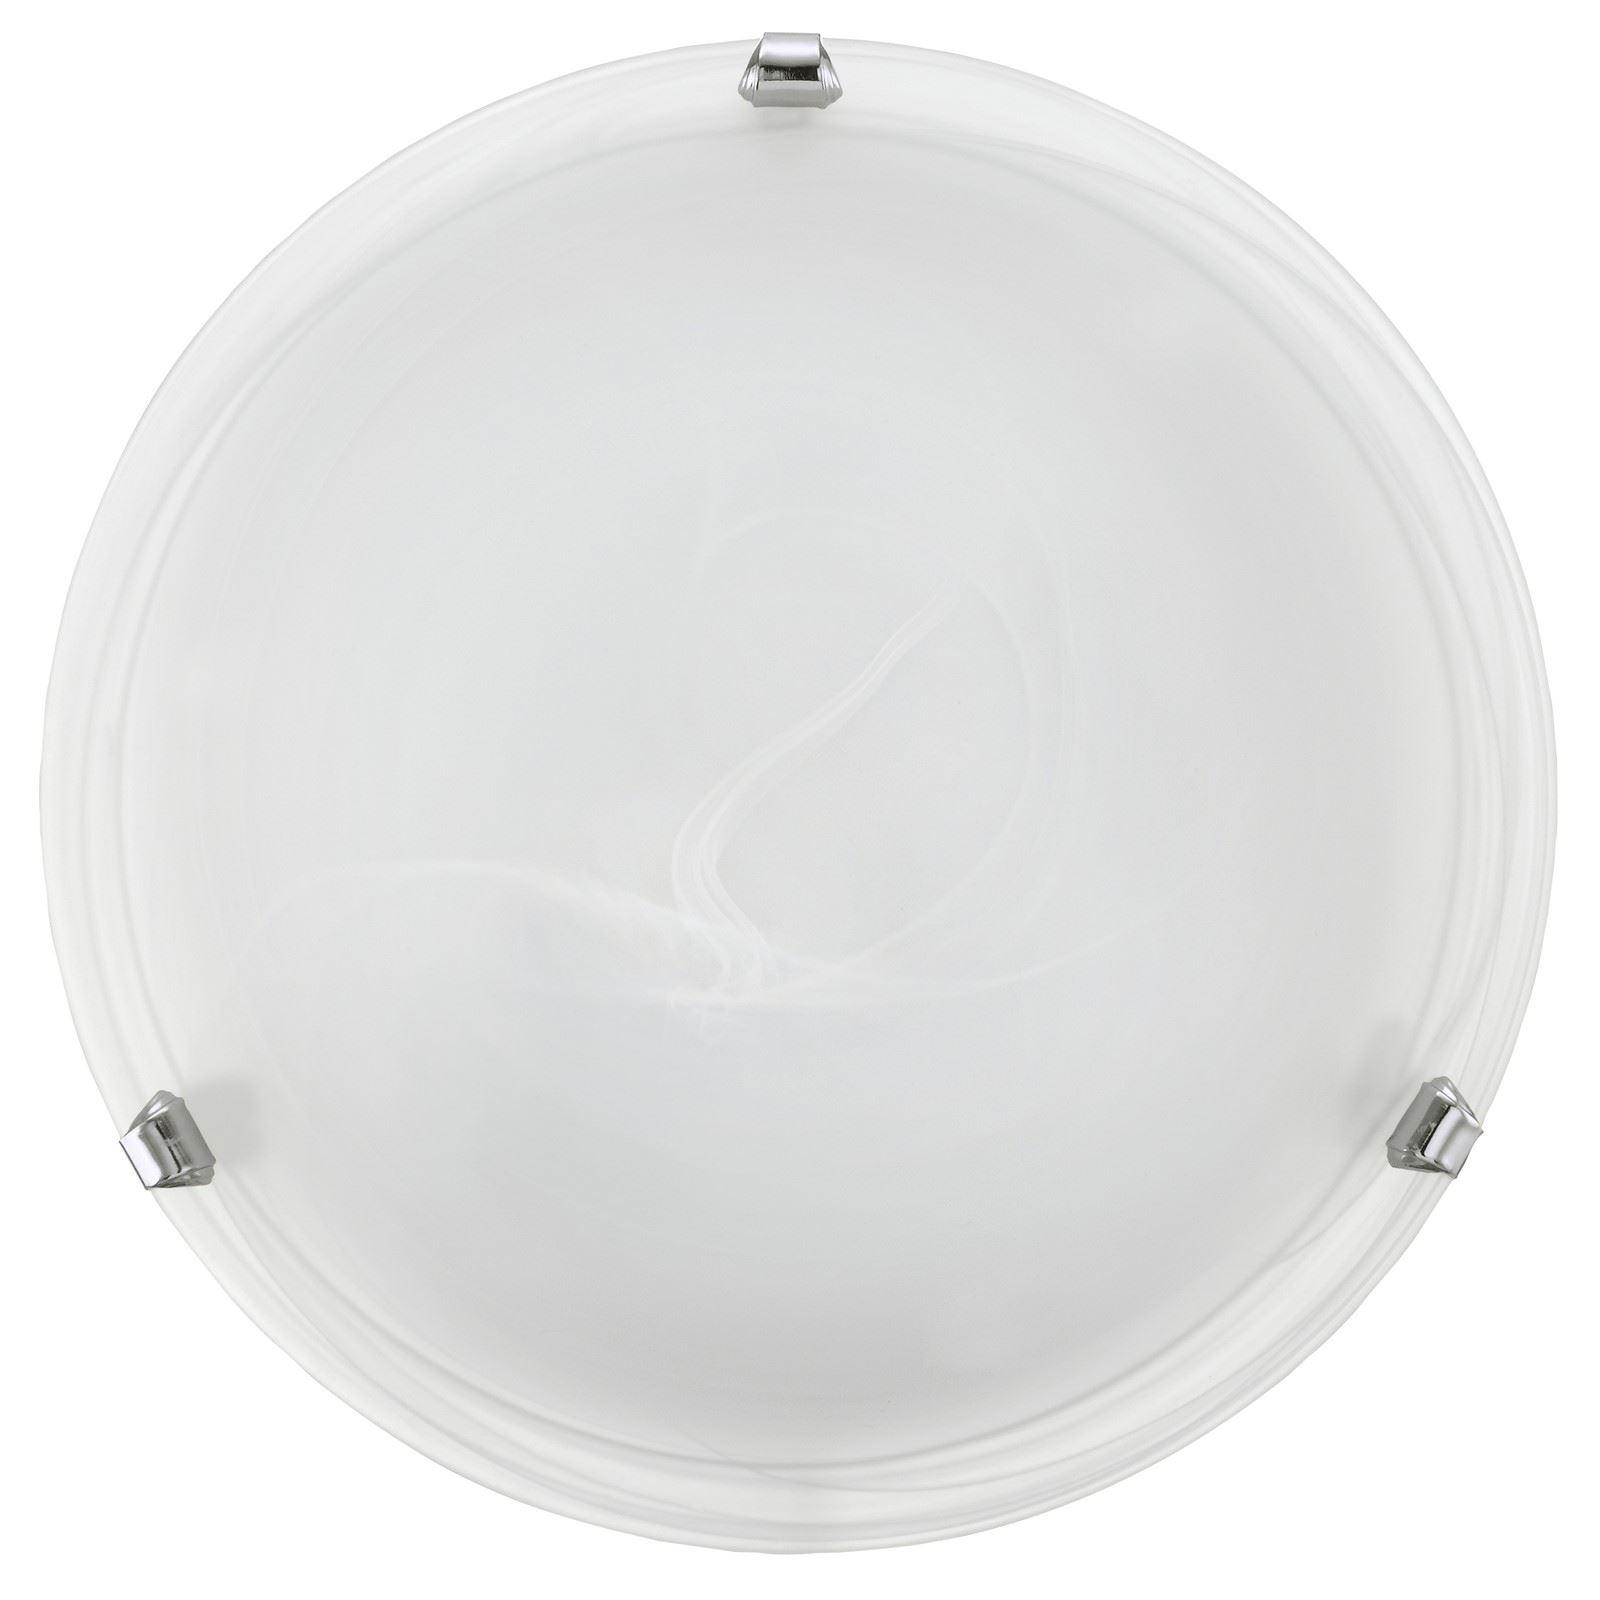 Salome 1 Ceiling Light E27 Alabaster Glass Chrome Finish